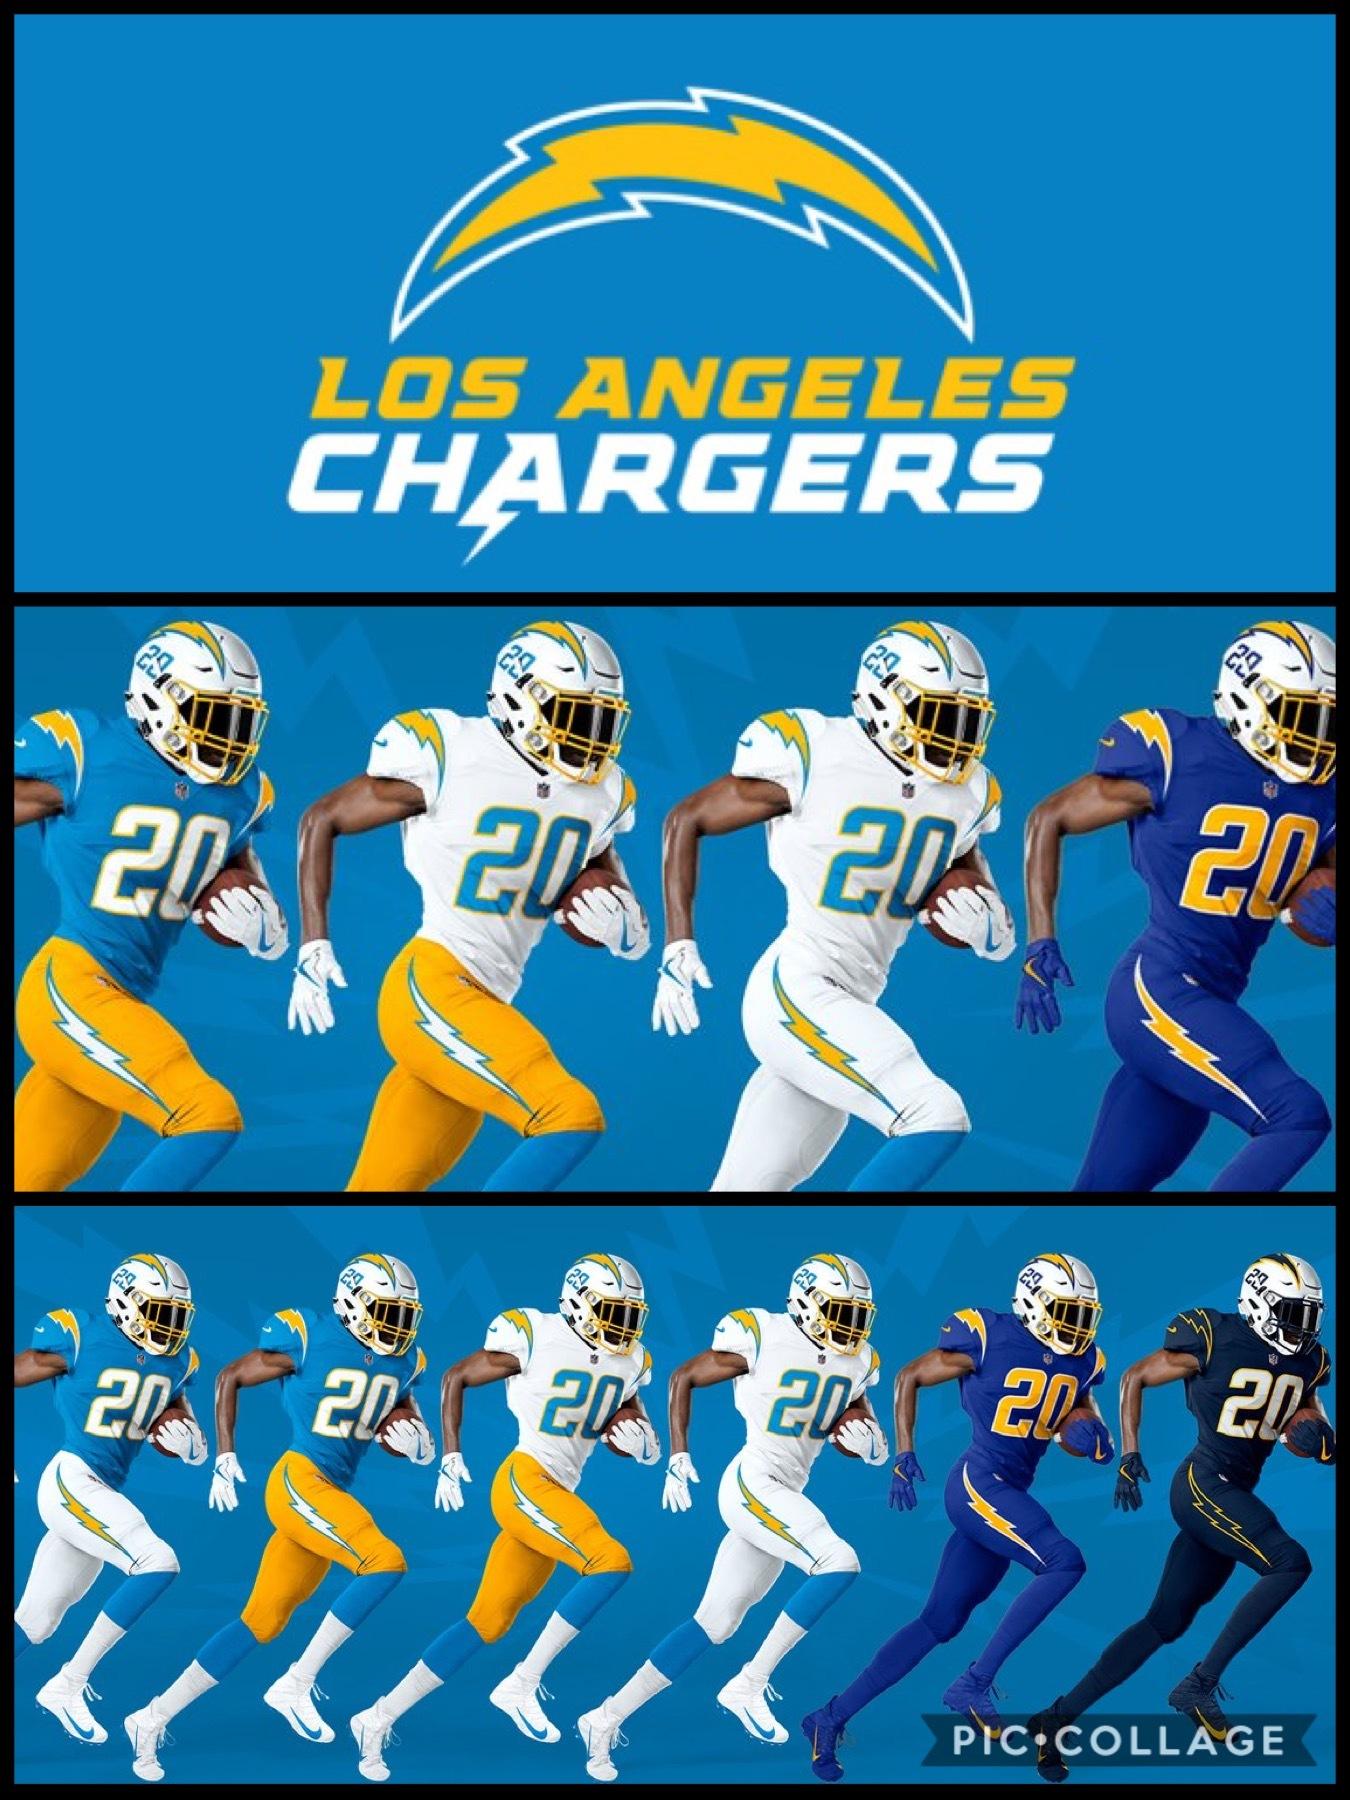 NFL2020新ユニフォーム ロスアンゼルス チャージャース